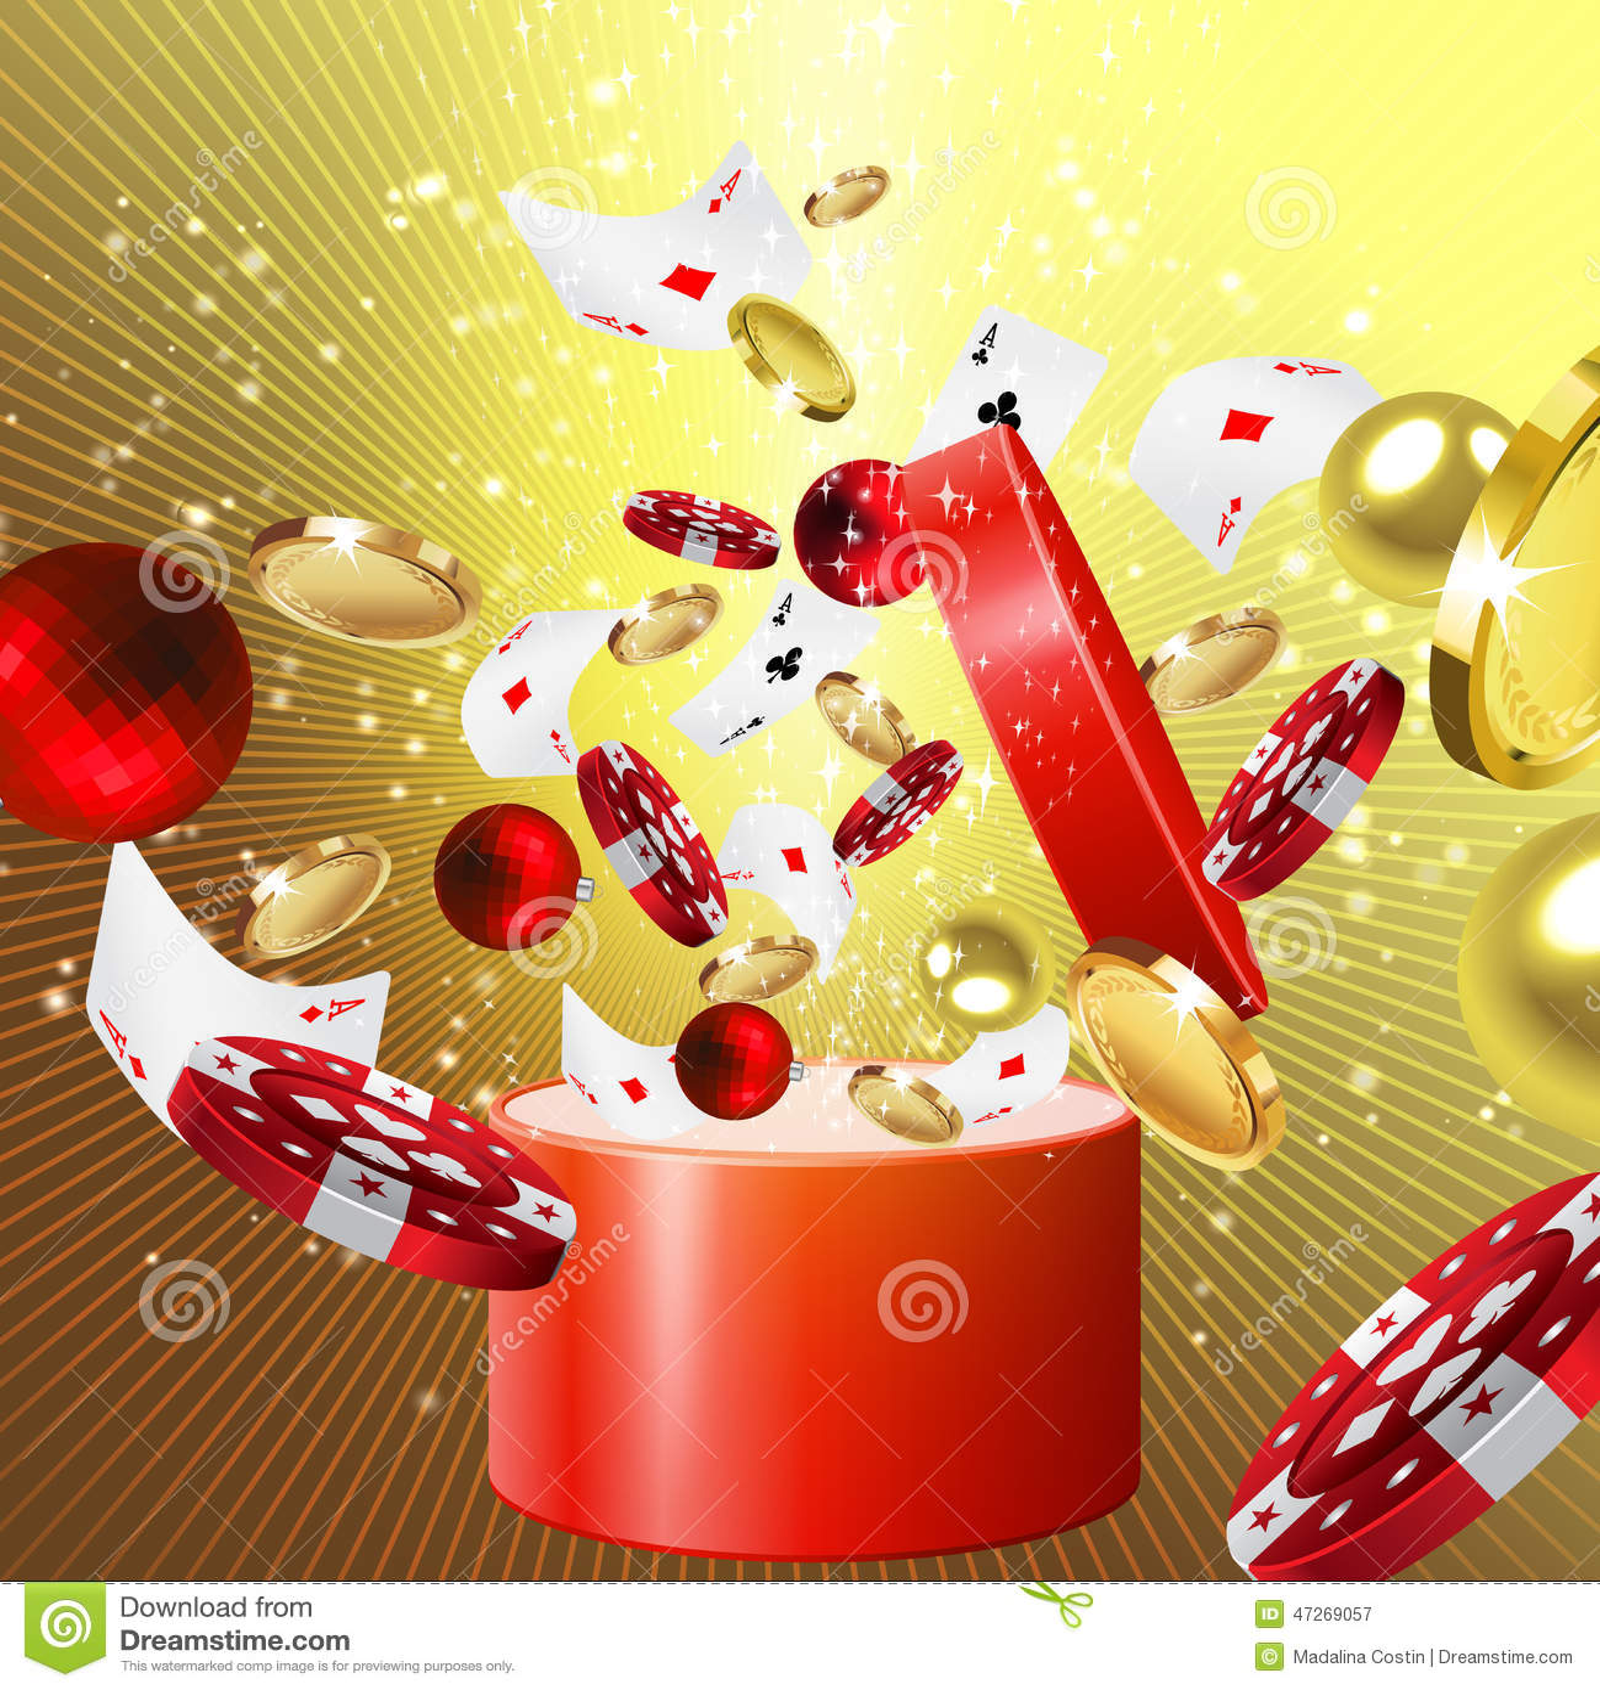 Golden horse casino 14